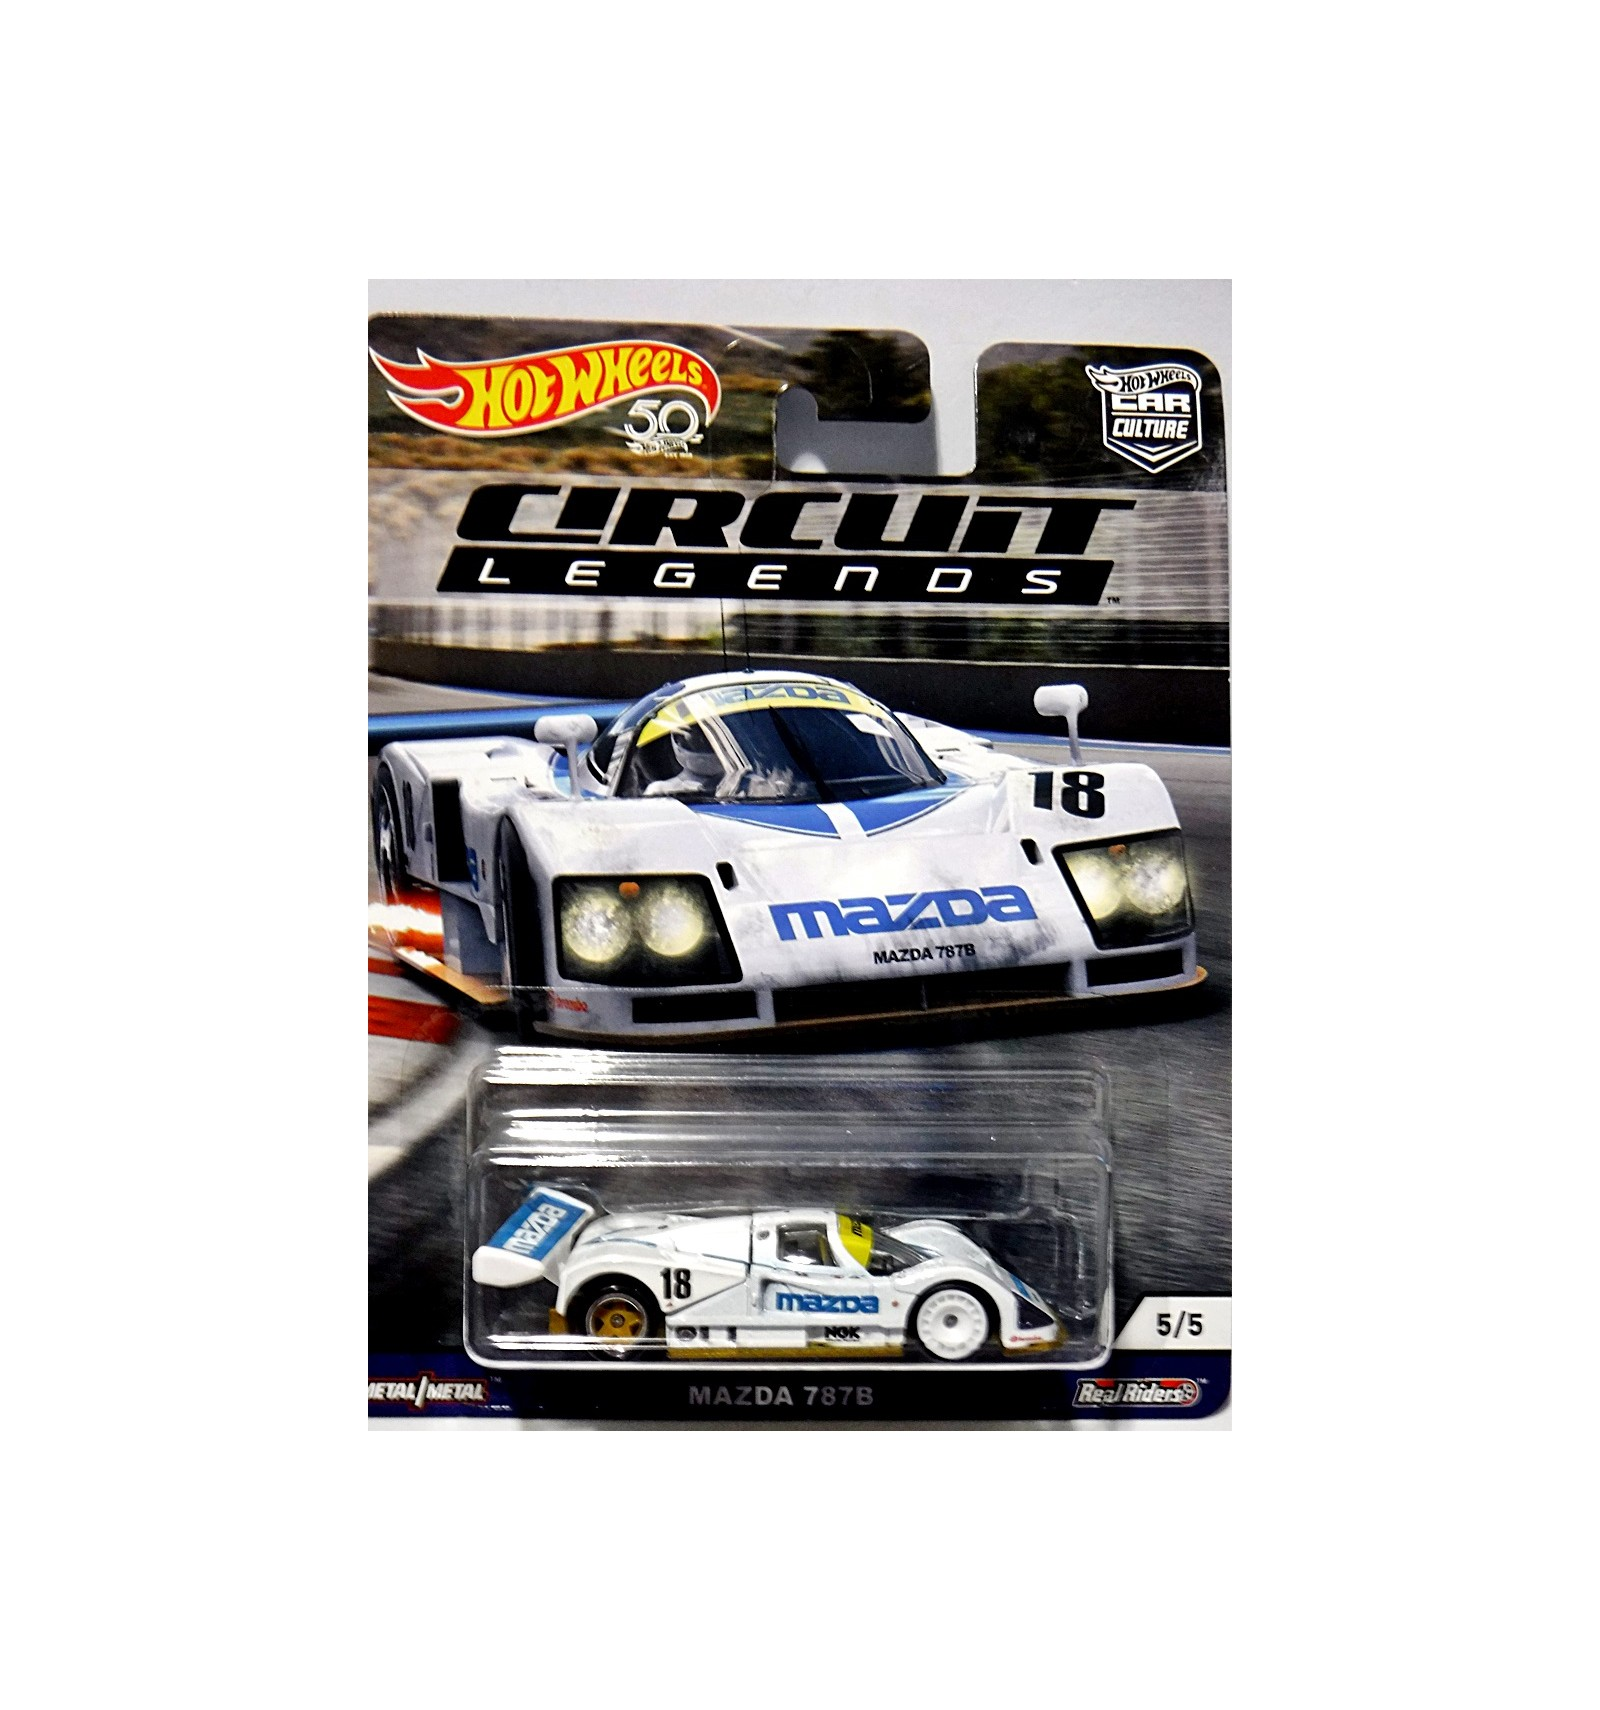 Hot Wheels Car Culture Circuit Legends Mazda 787b Race Car Global Diecast Direct